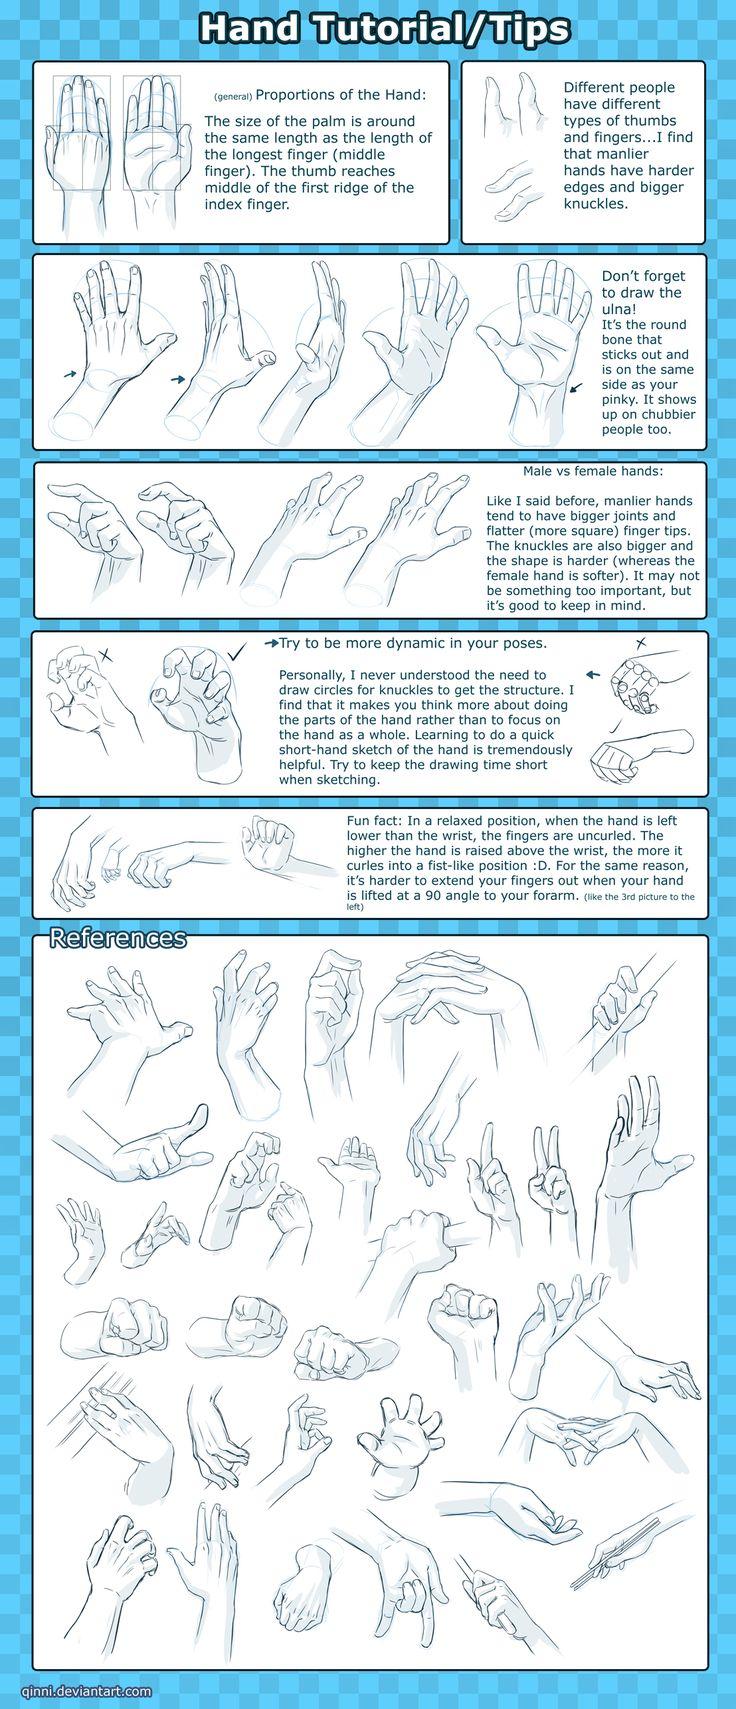 Hand Tutorial -Tips Reference- by Qinni on deviantART via PinCG.com